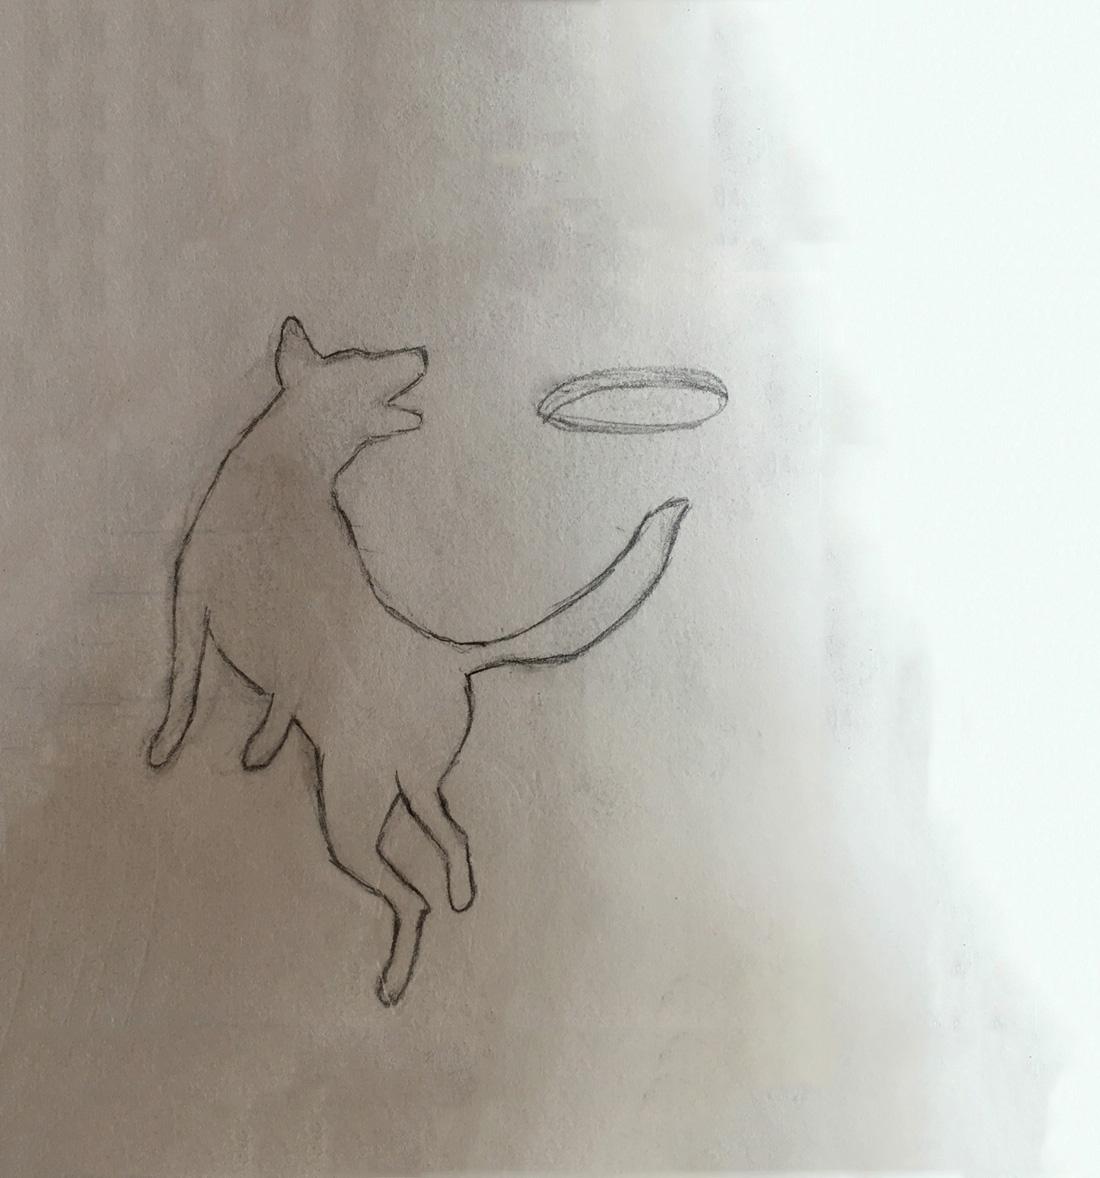 Frisbee Dog Sketch